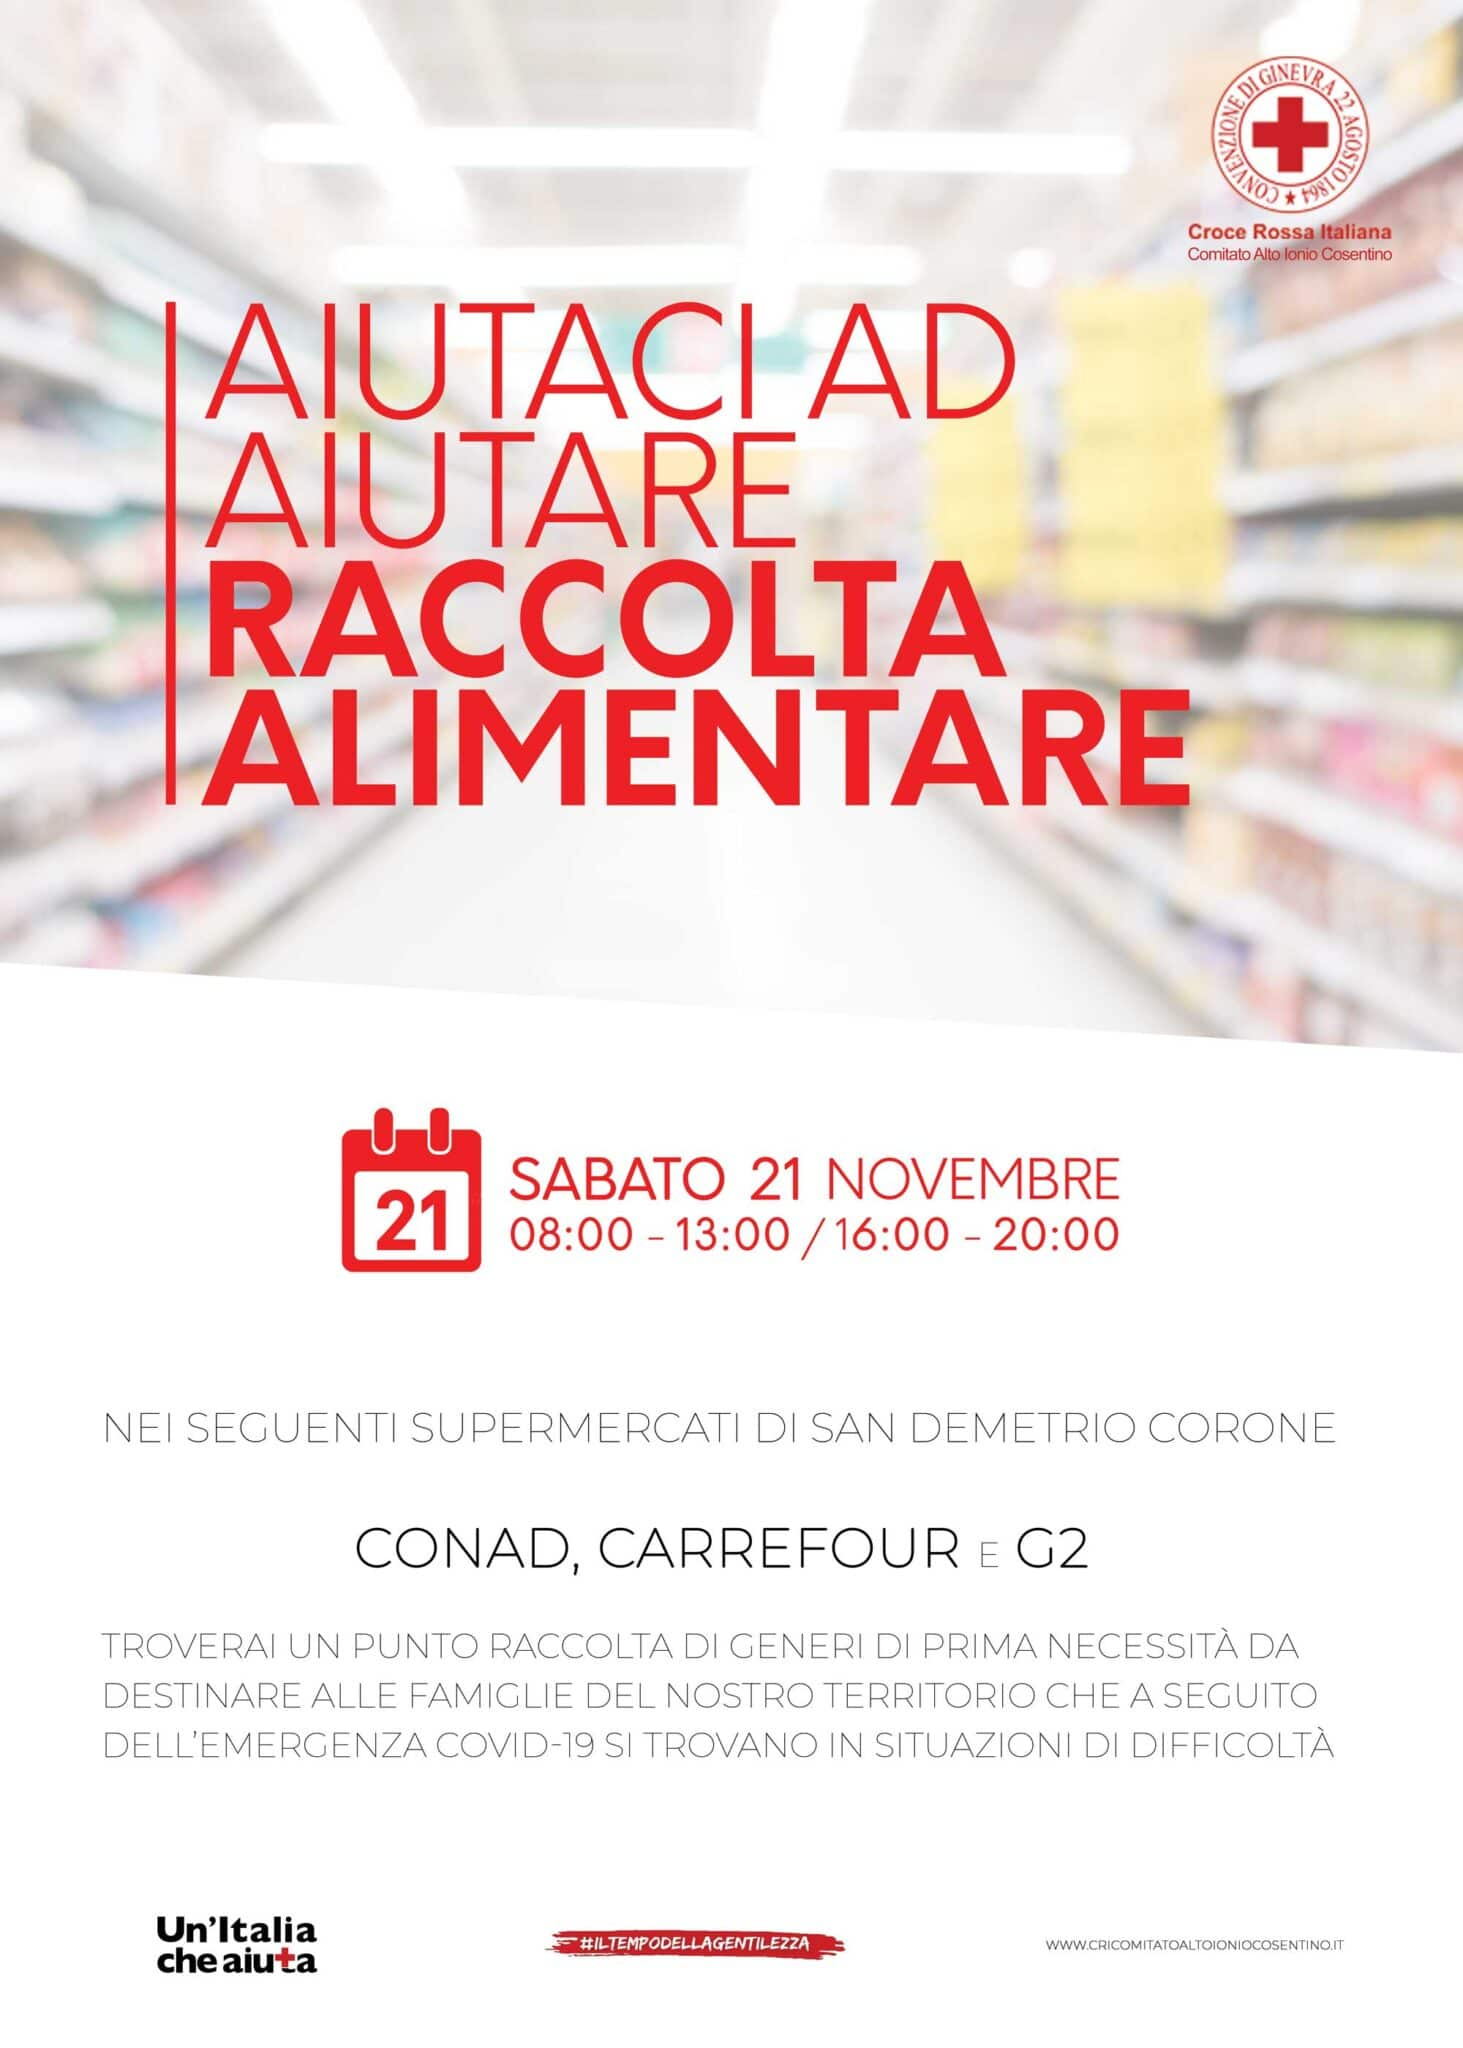 Raccolta alimentare 21 novembre - San Demetrio Corone (CS)